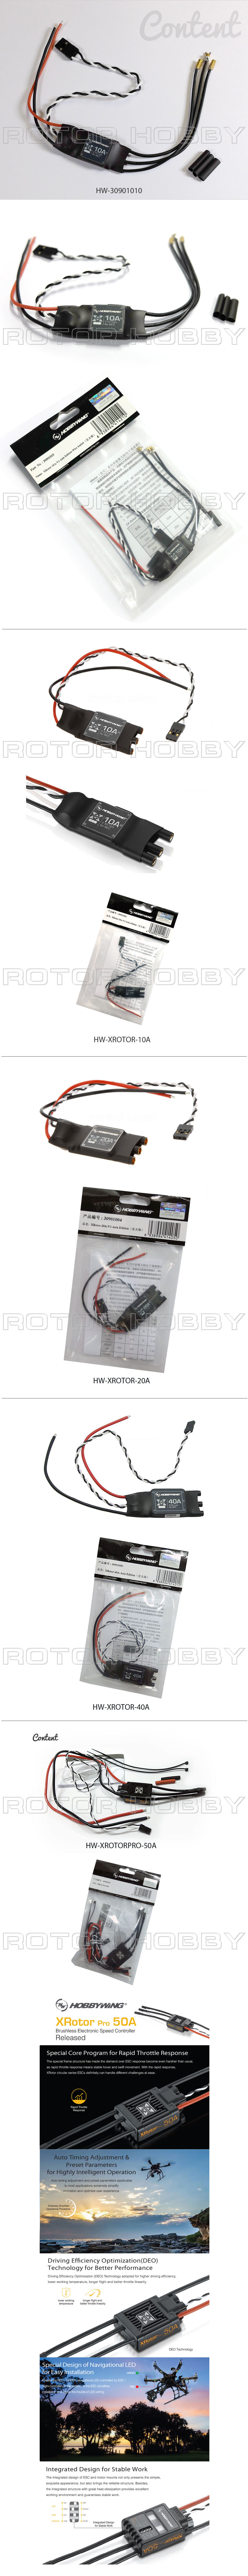 XROTOR 10A, 20A, 40A, Pro 50A ESC